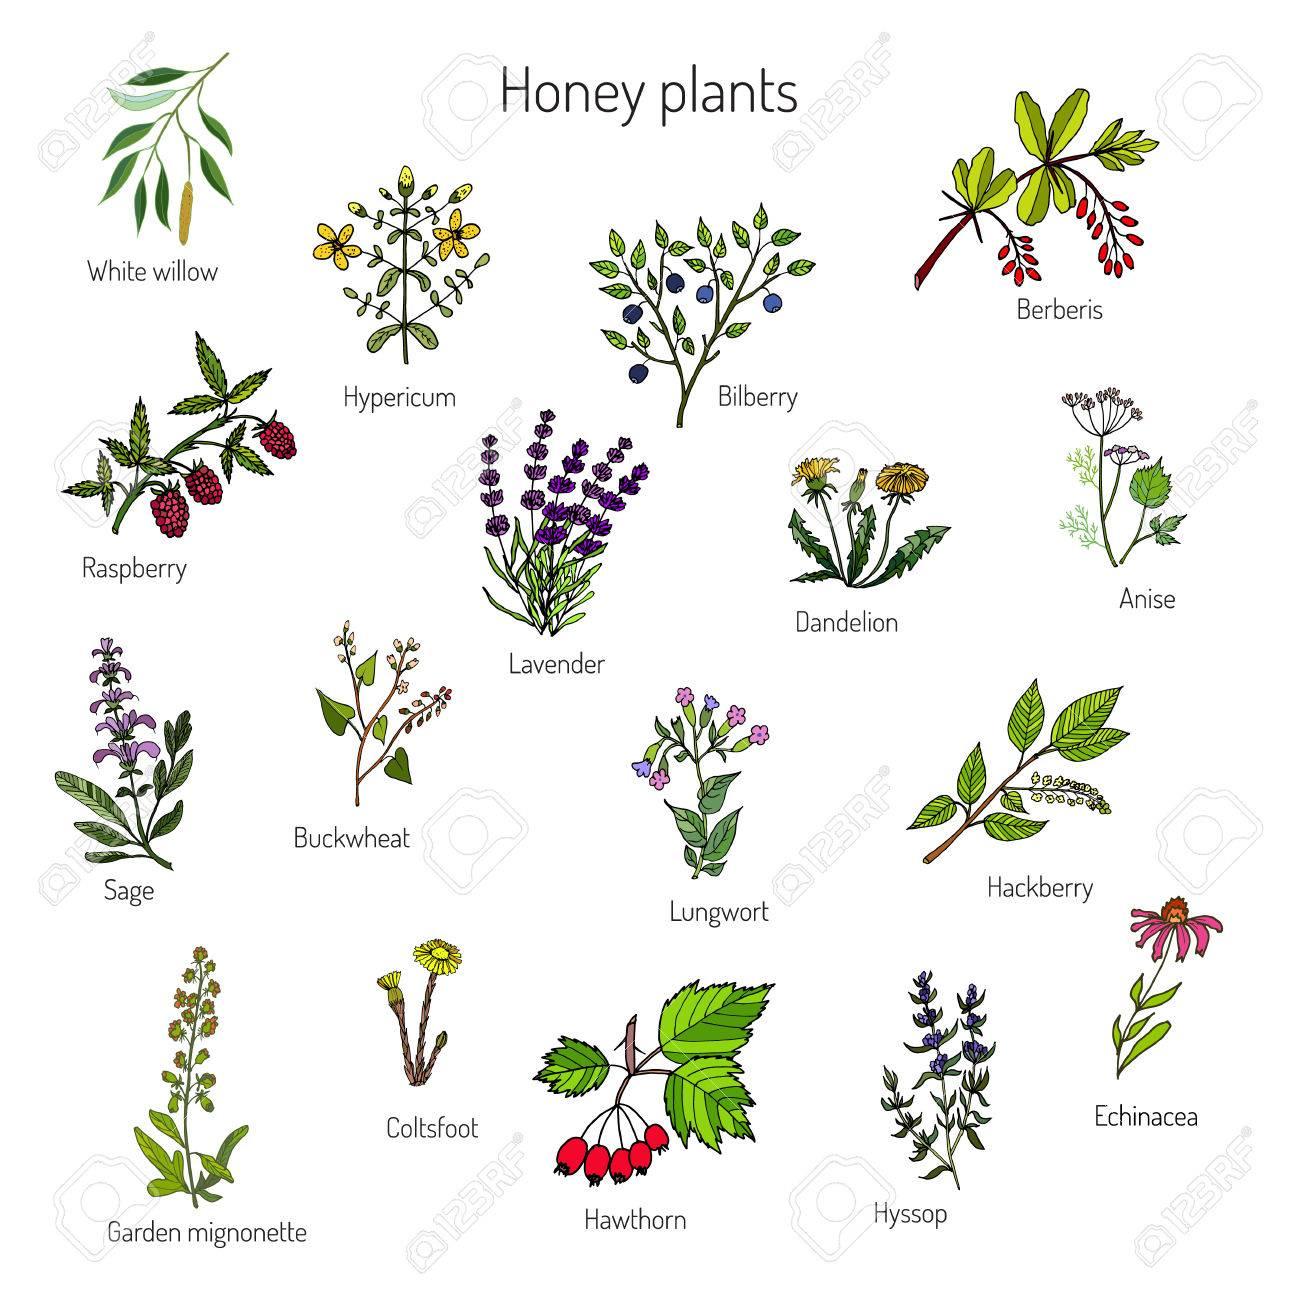 Image source plantsam com - Plants Nectar Sources For Honey Bees Vector Set Stock Vector 64082375